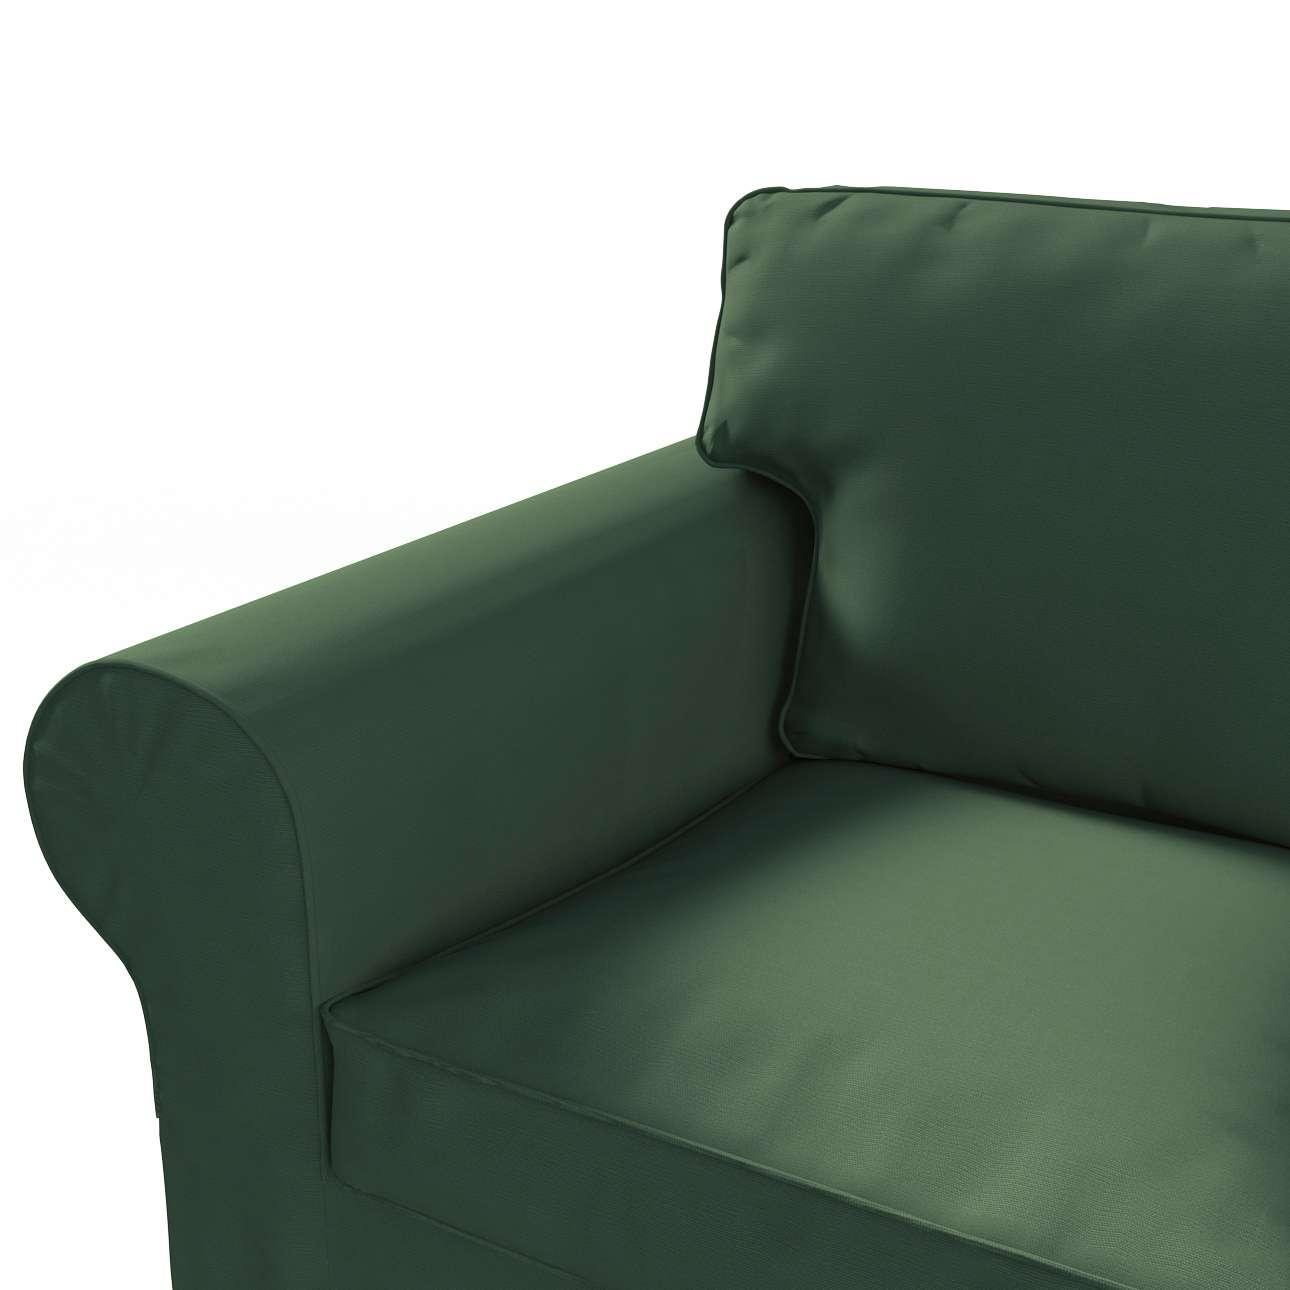 Ektorp 3-Sitzer Sofabezug nicht ausklappbar Sofabezug für  Ektorp 3-Sitzer nicht ausklappbar von der Kollektion Cotton Panama, Stoff: 702-06